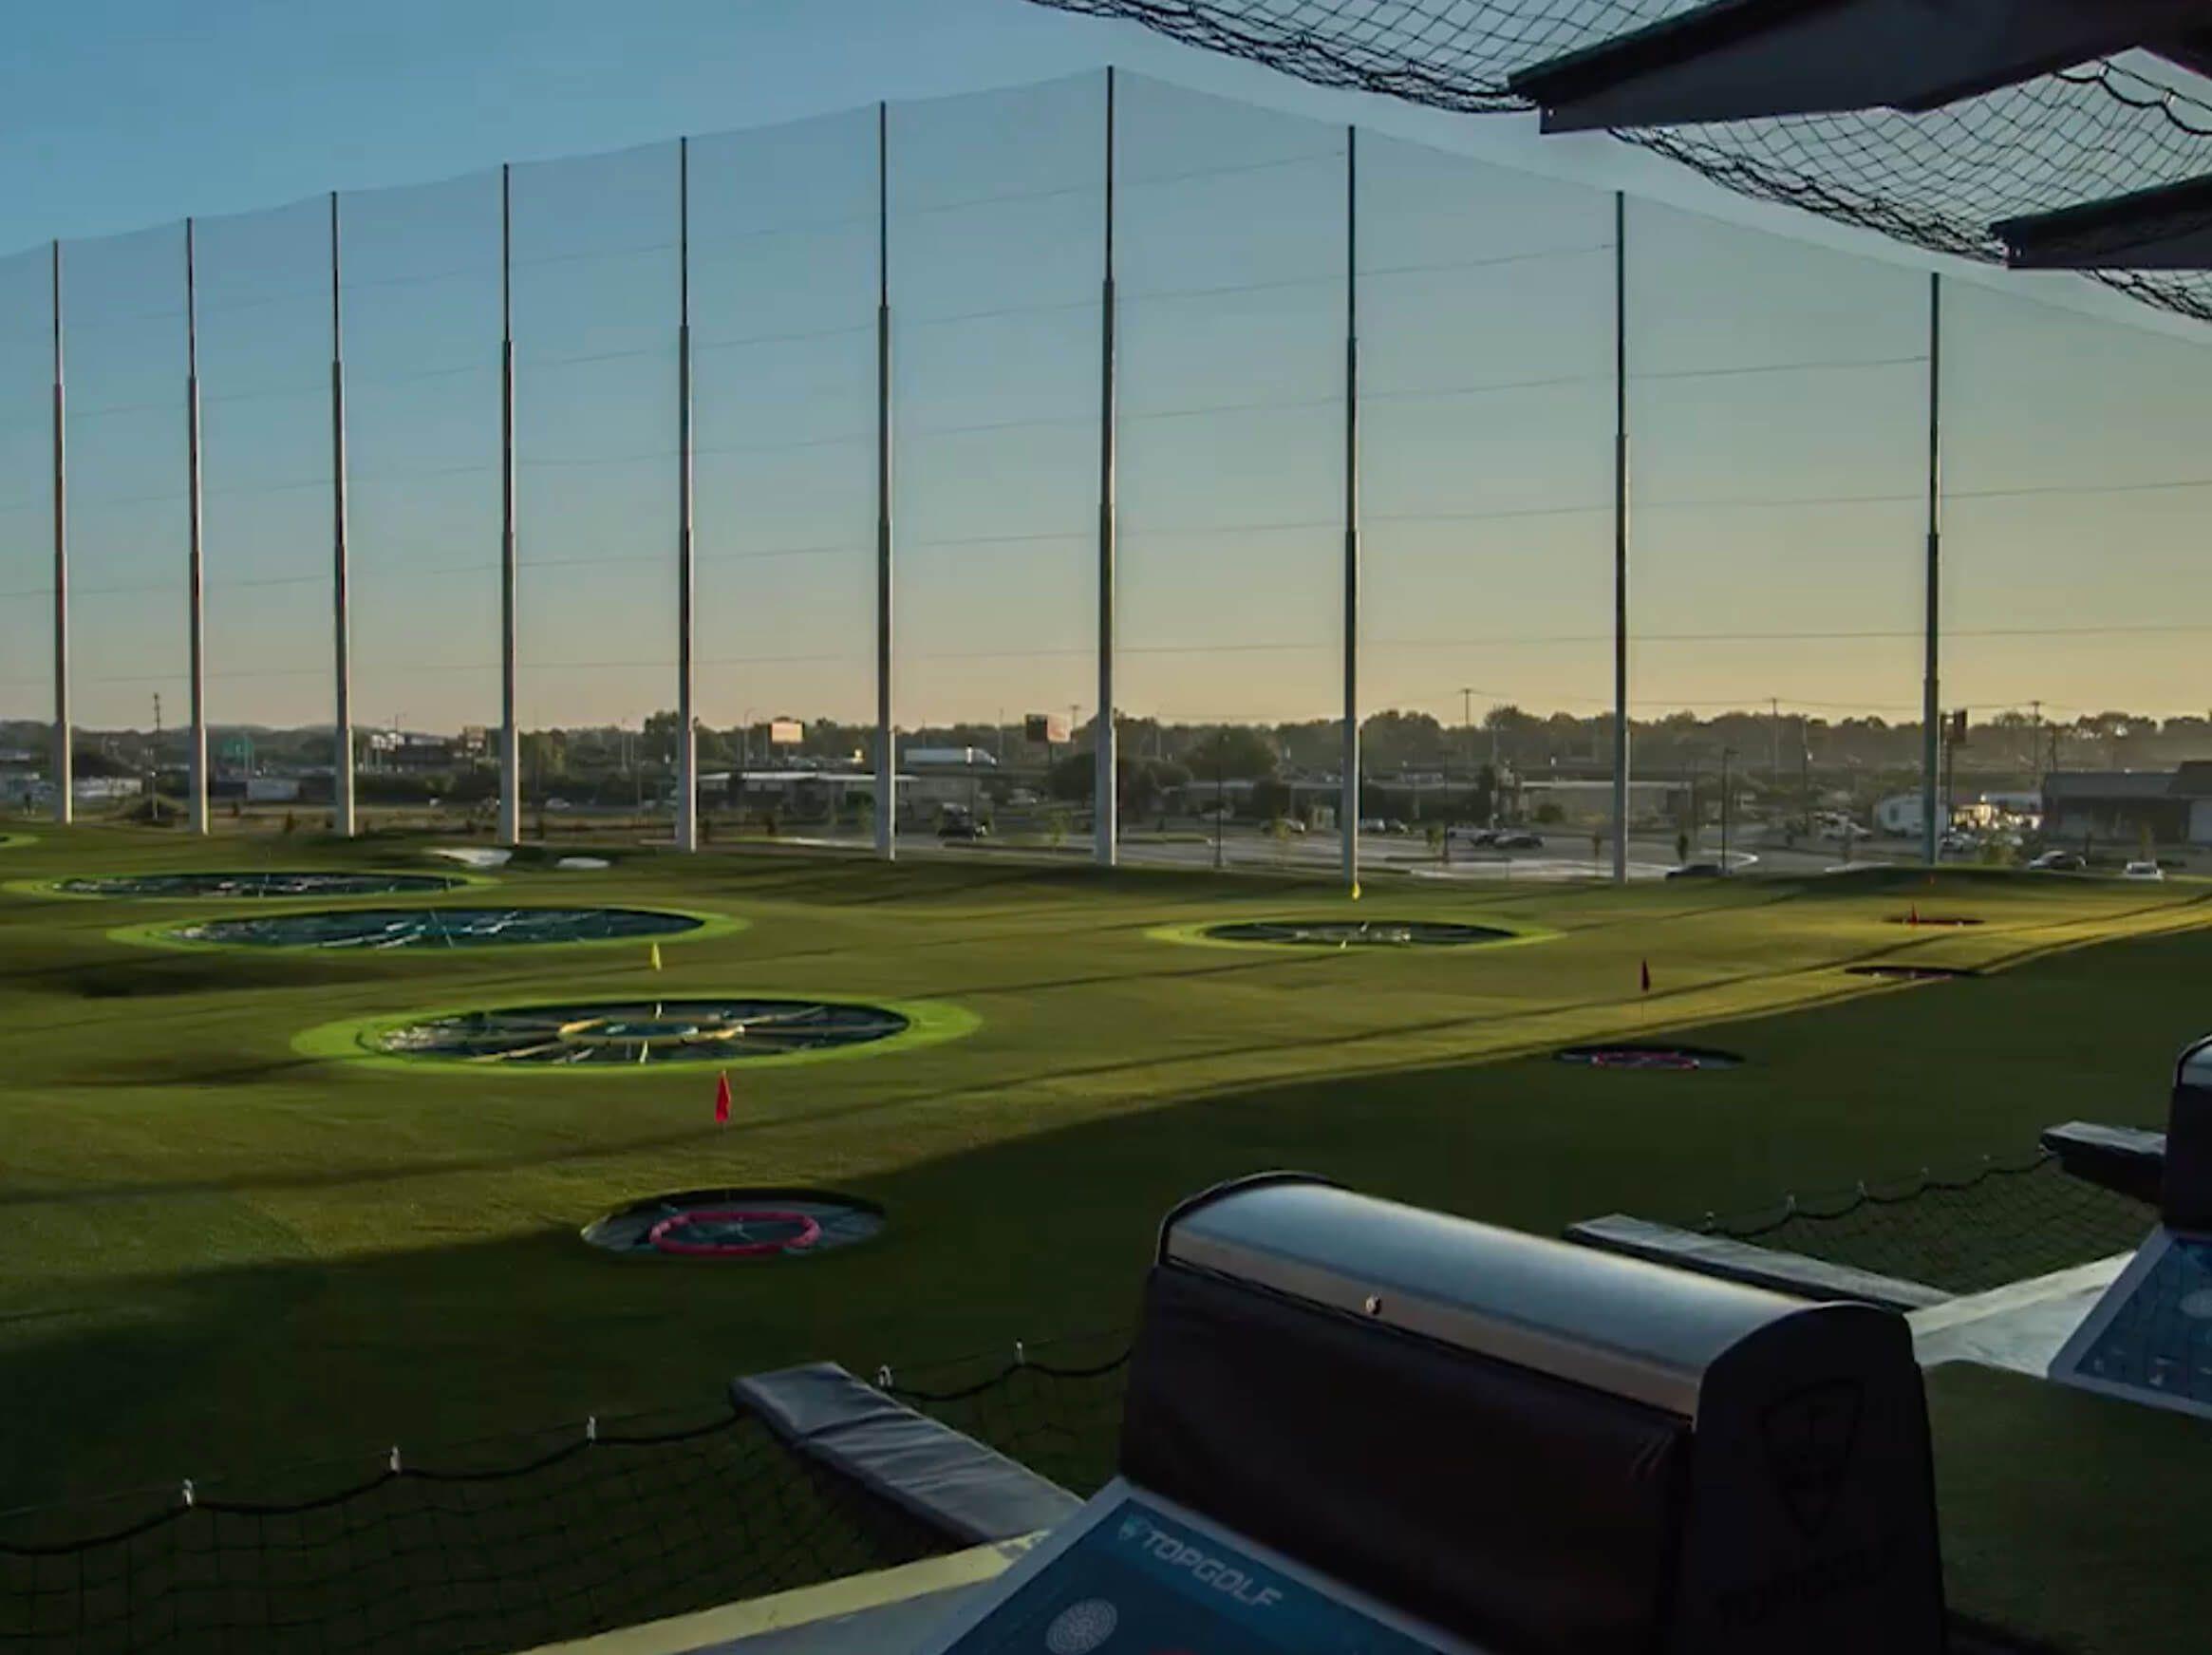 Topgolf: Golf, Party Venue, Sports Bar & Restaurant